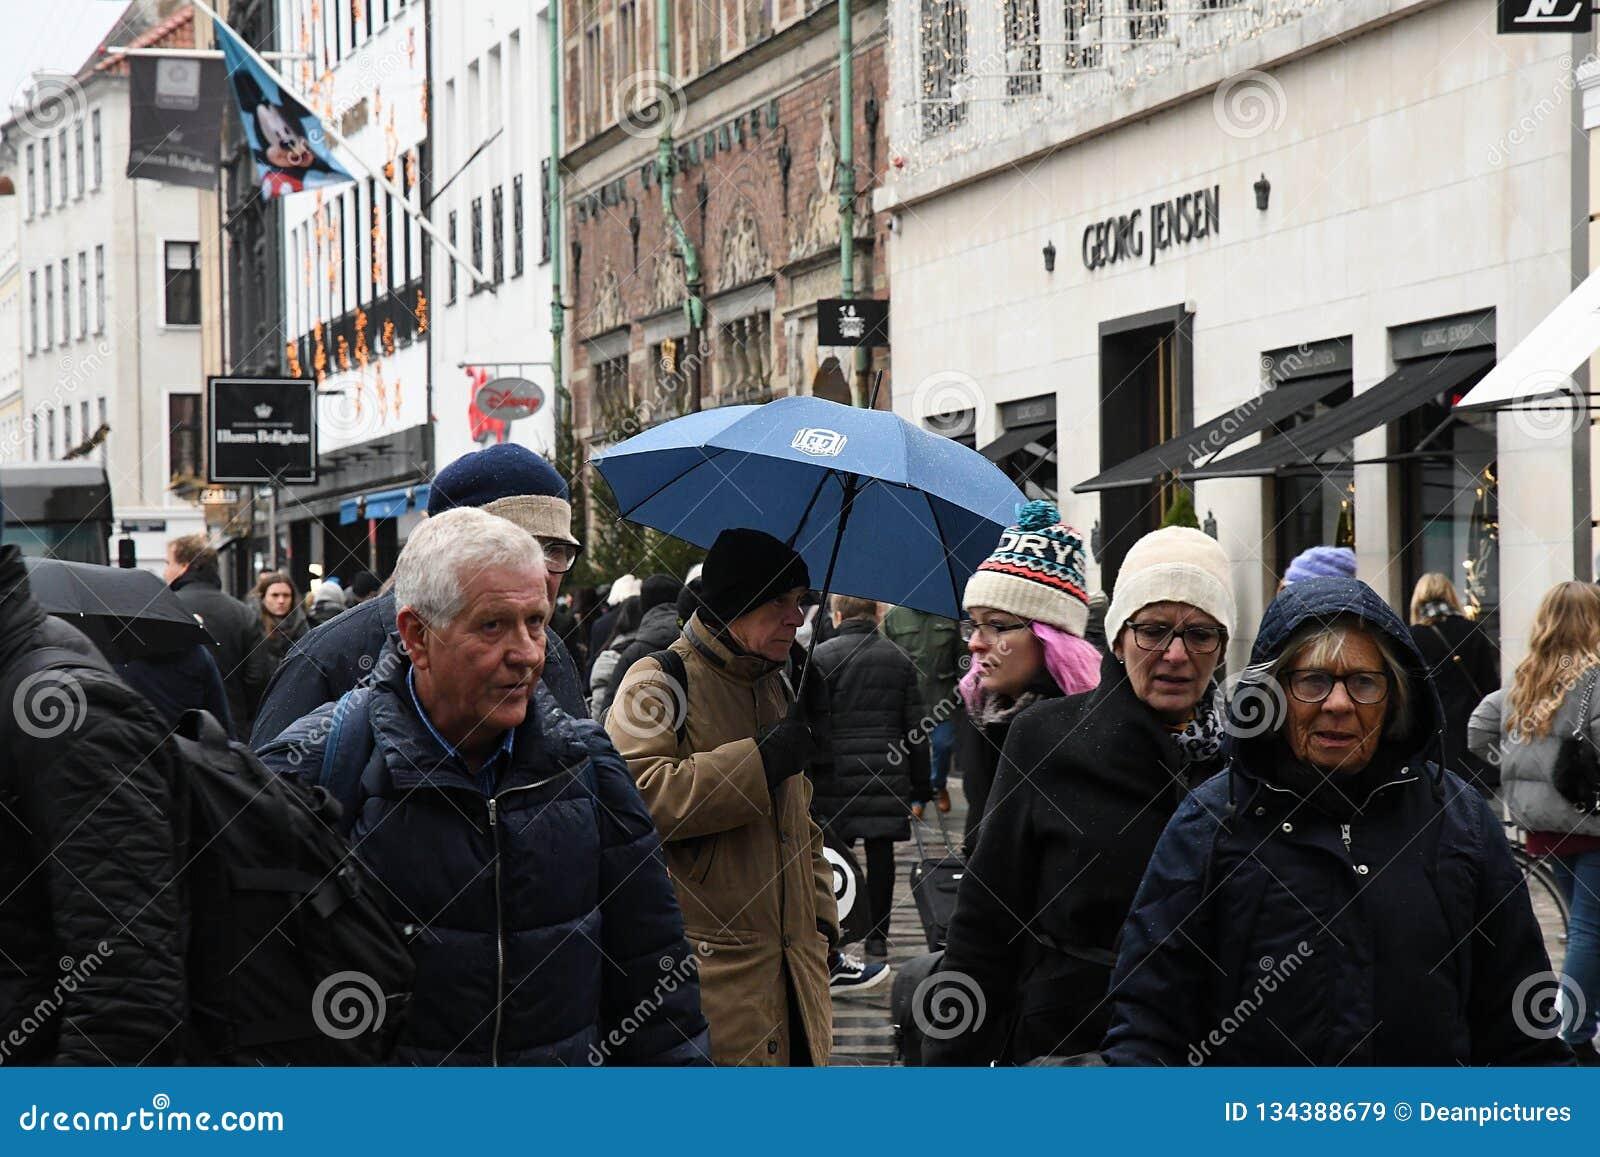 Shoper Unders Umbrellas Rainy Weather Editorial Stock Image Image